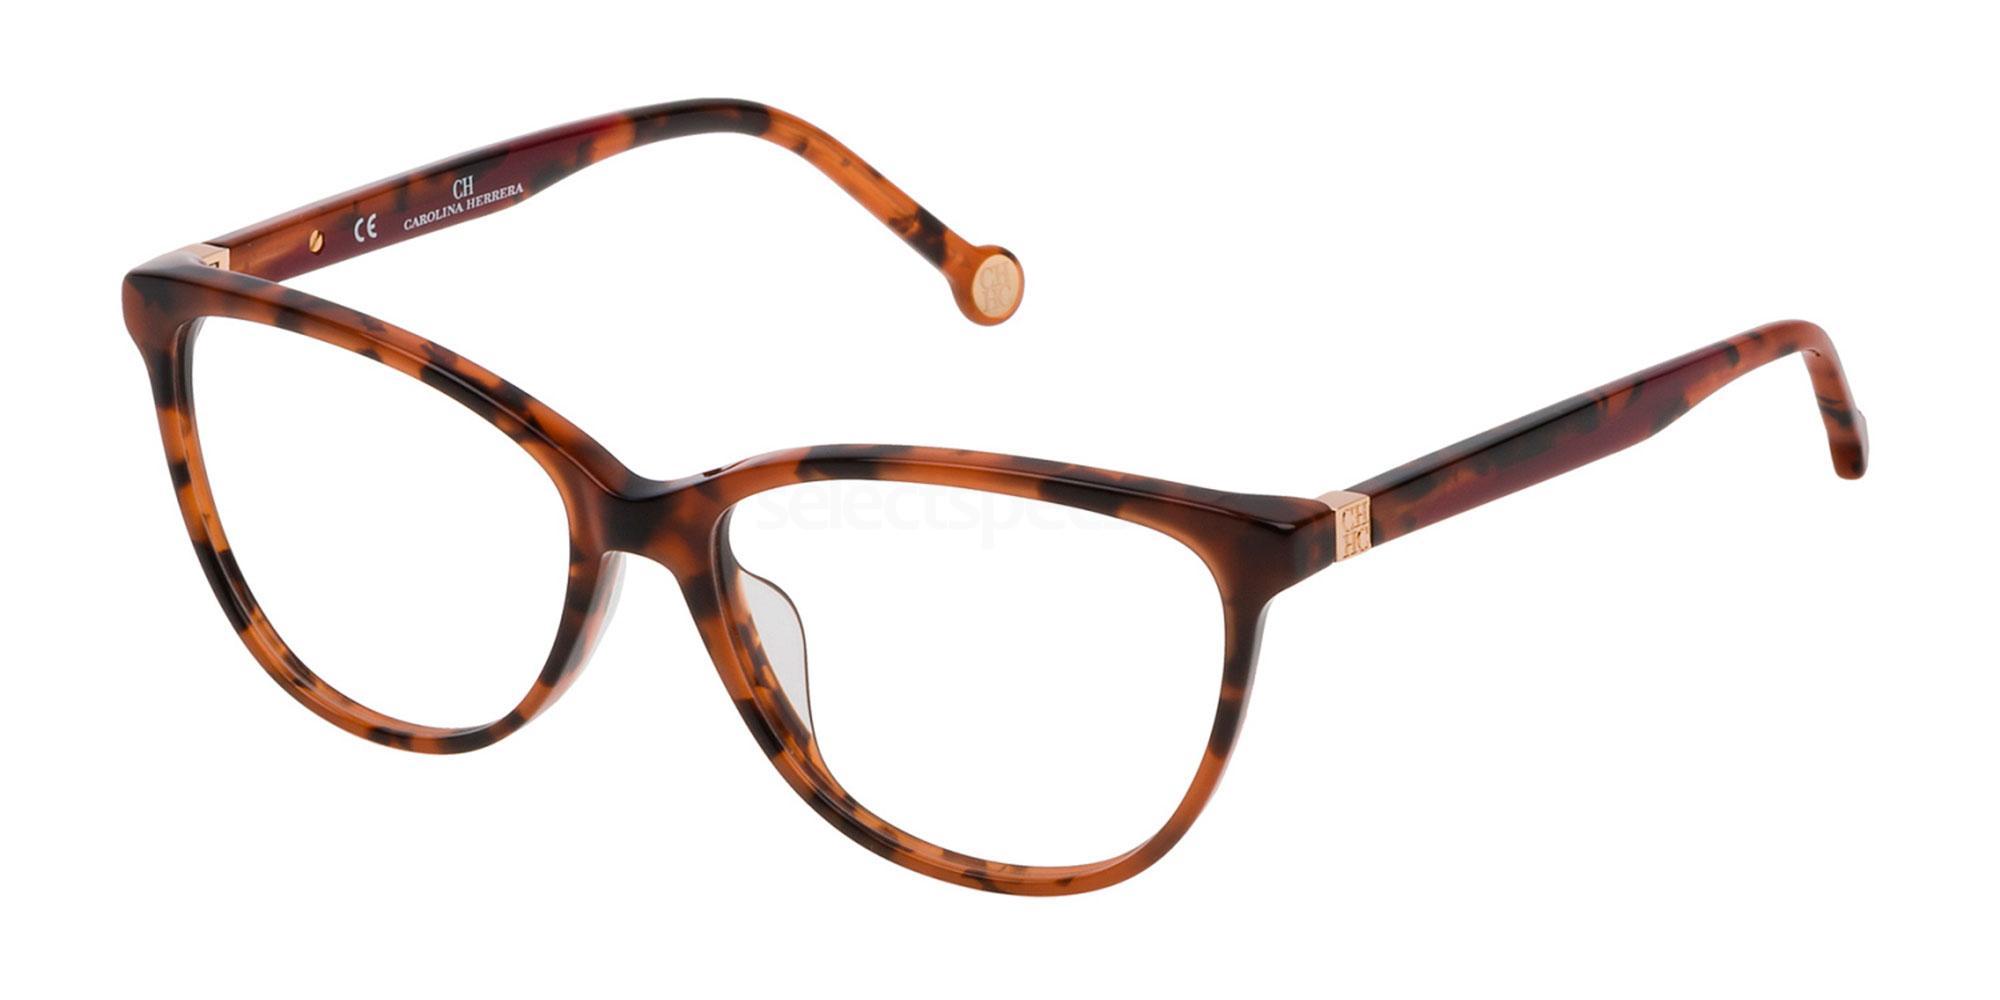 01FG VHE770 Glasses, CH Carolina Herrera